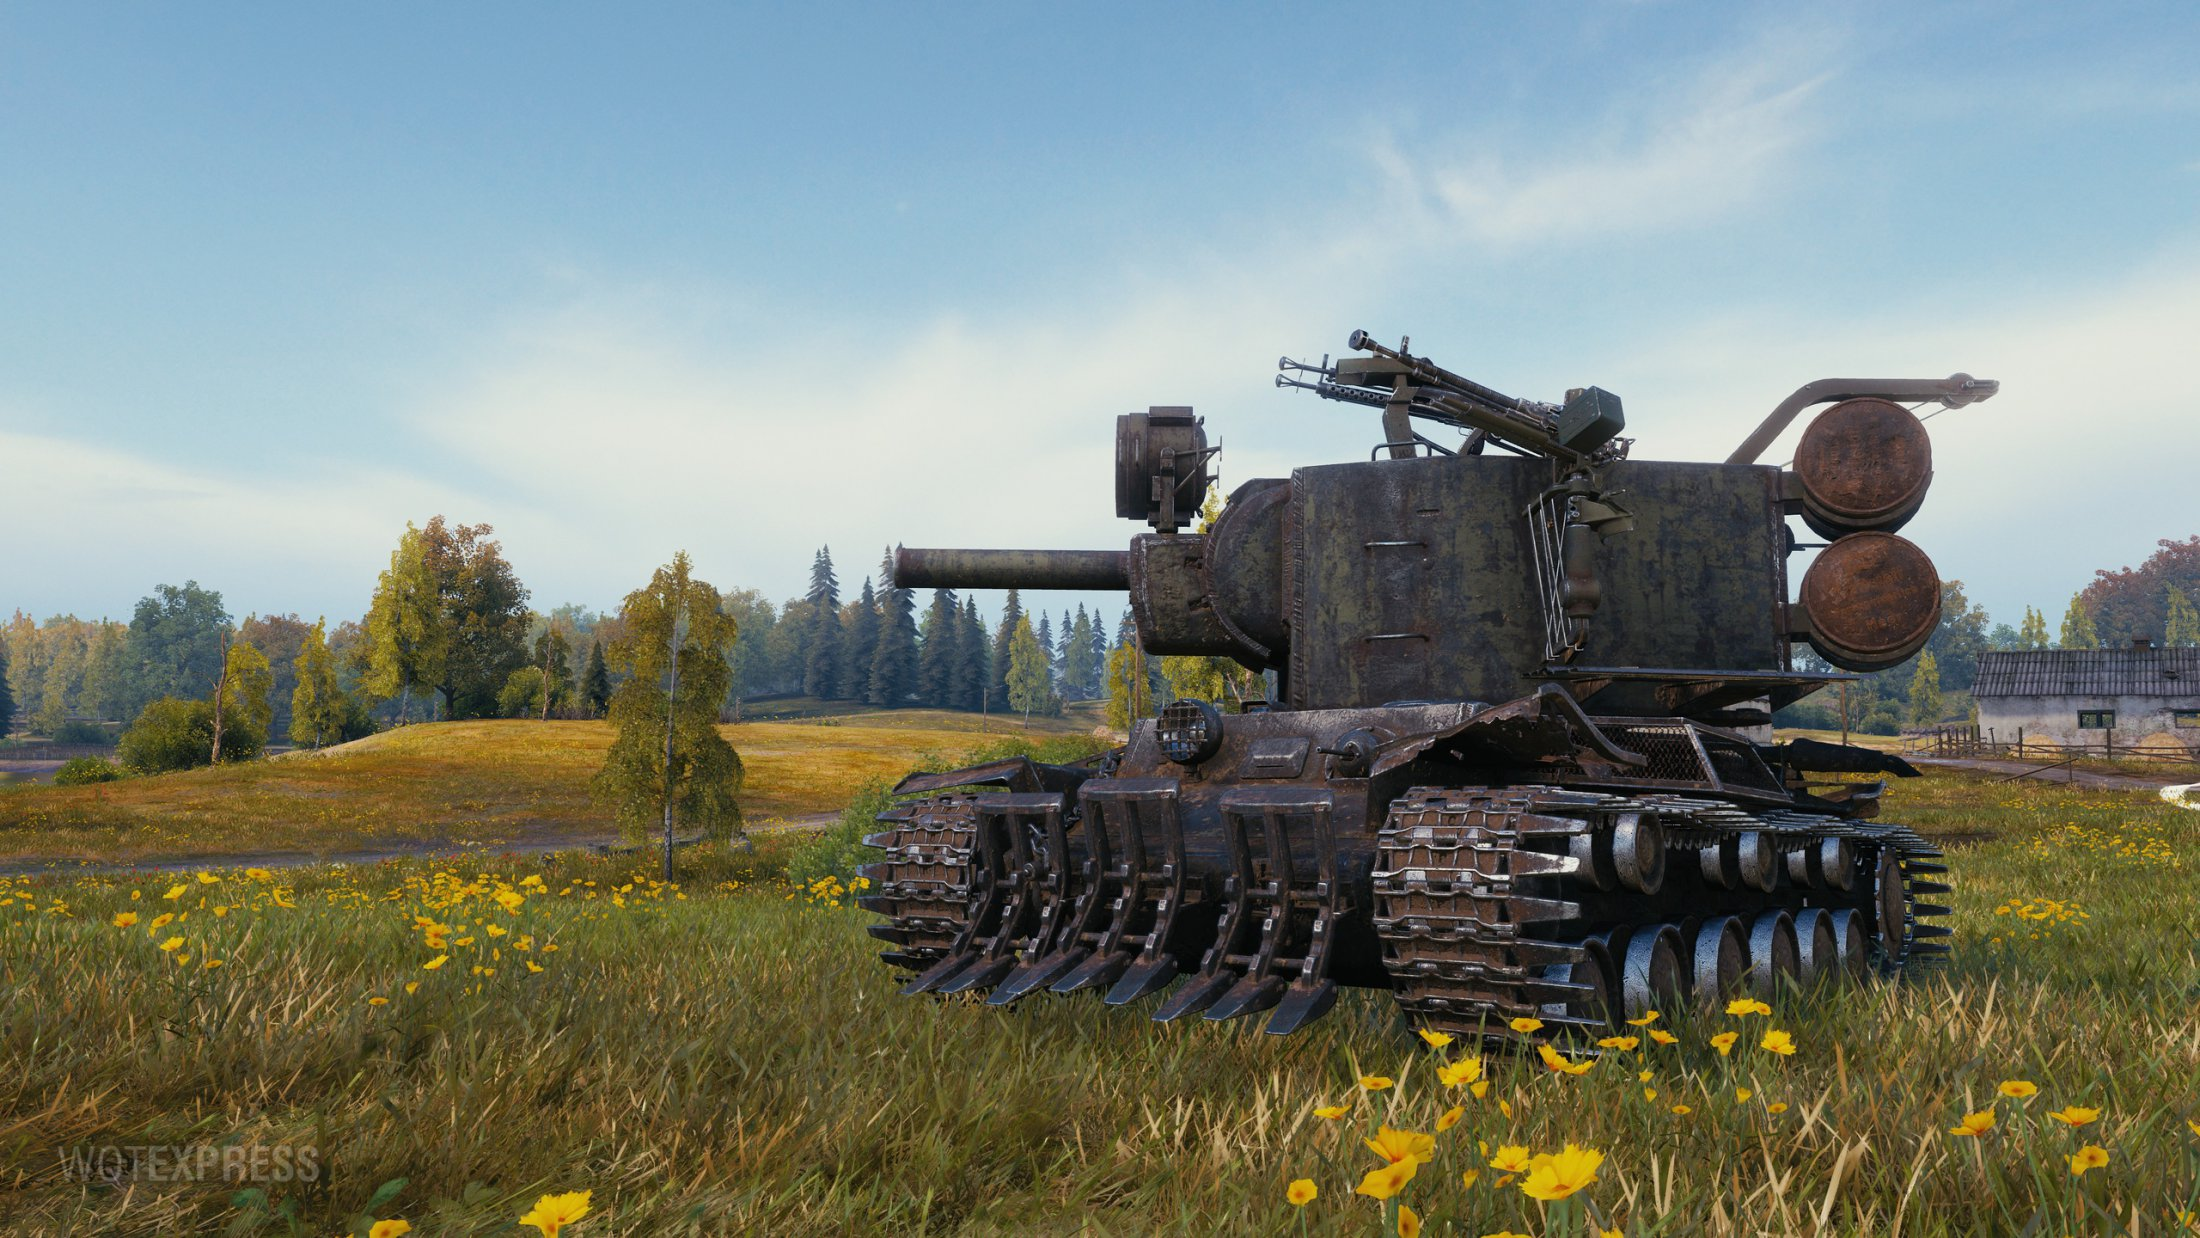 P9t-3SV3r1s